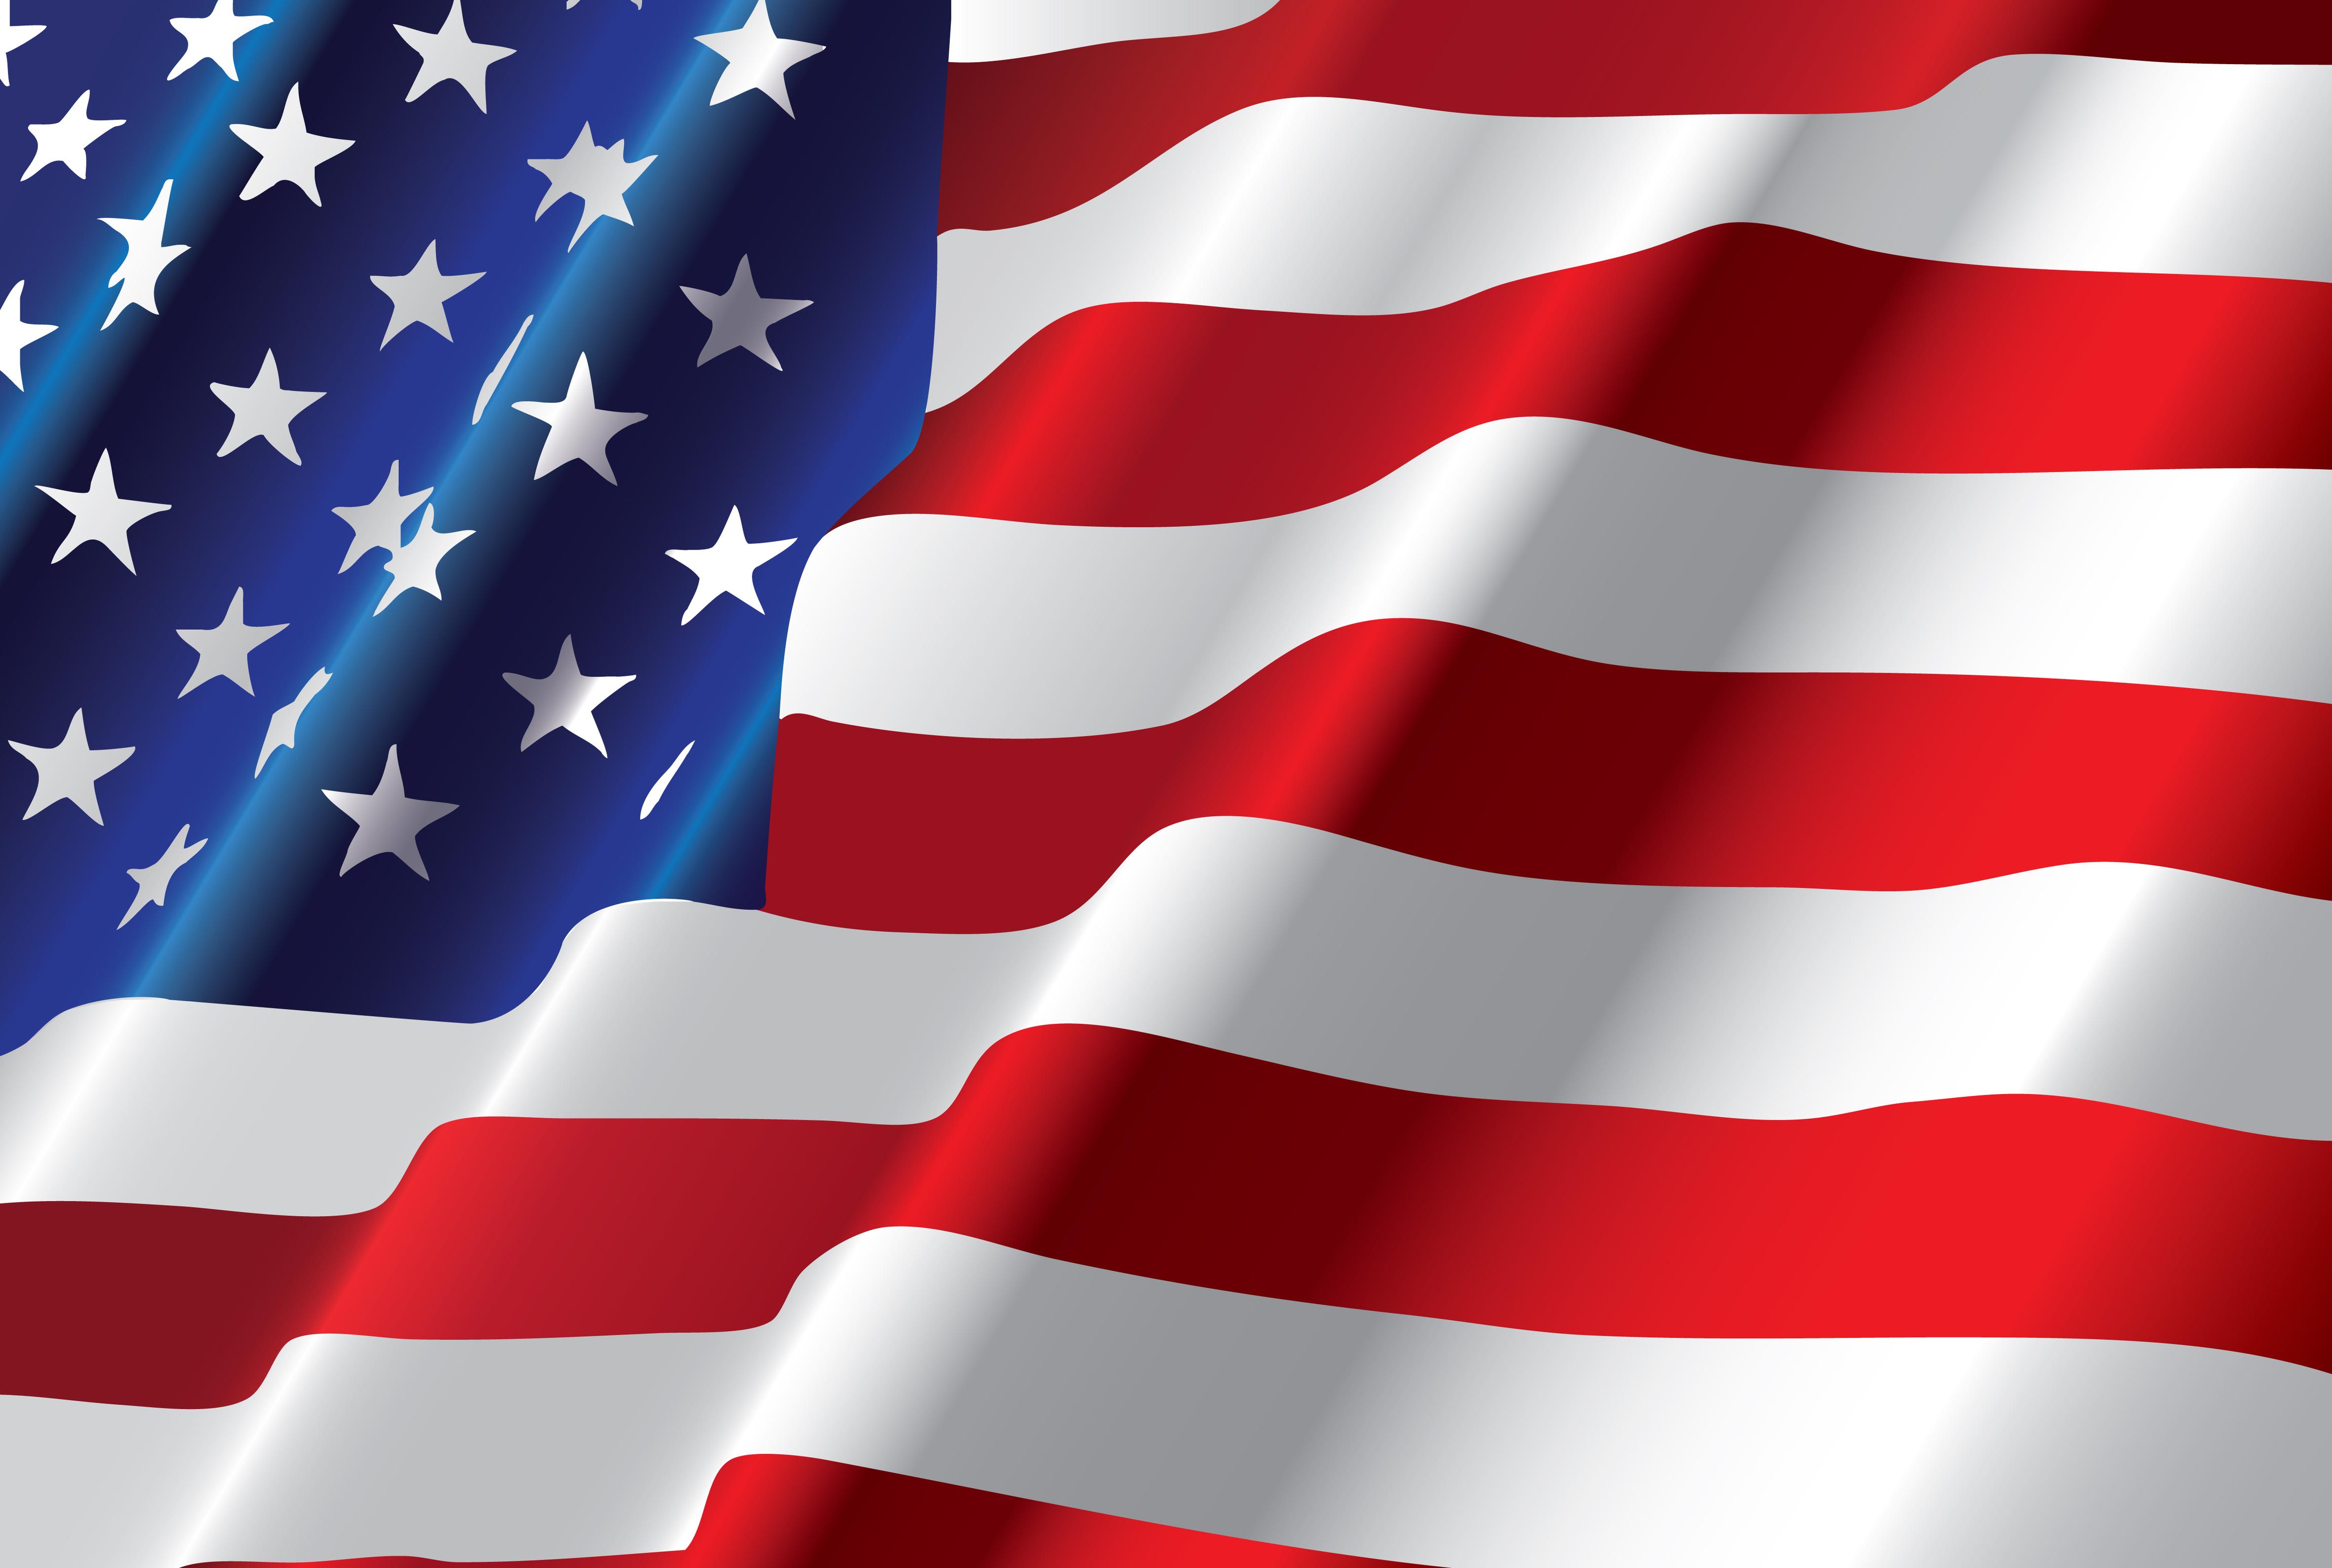 Flag Of Us Wallpaper3 4722x3176jpg 4722x3176